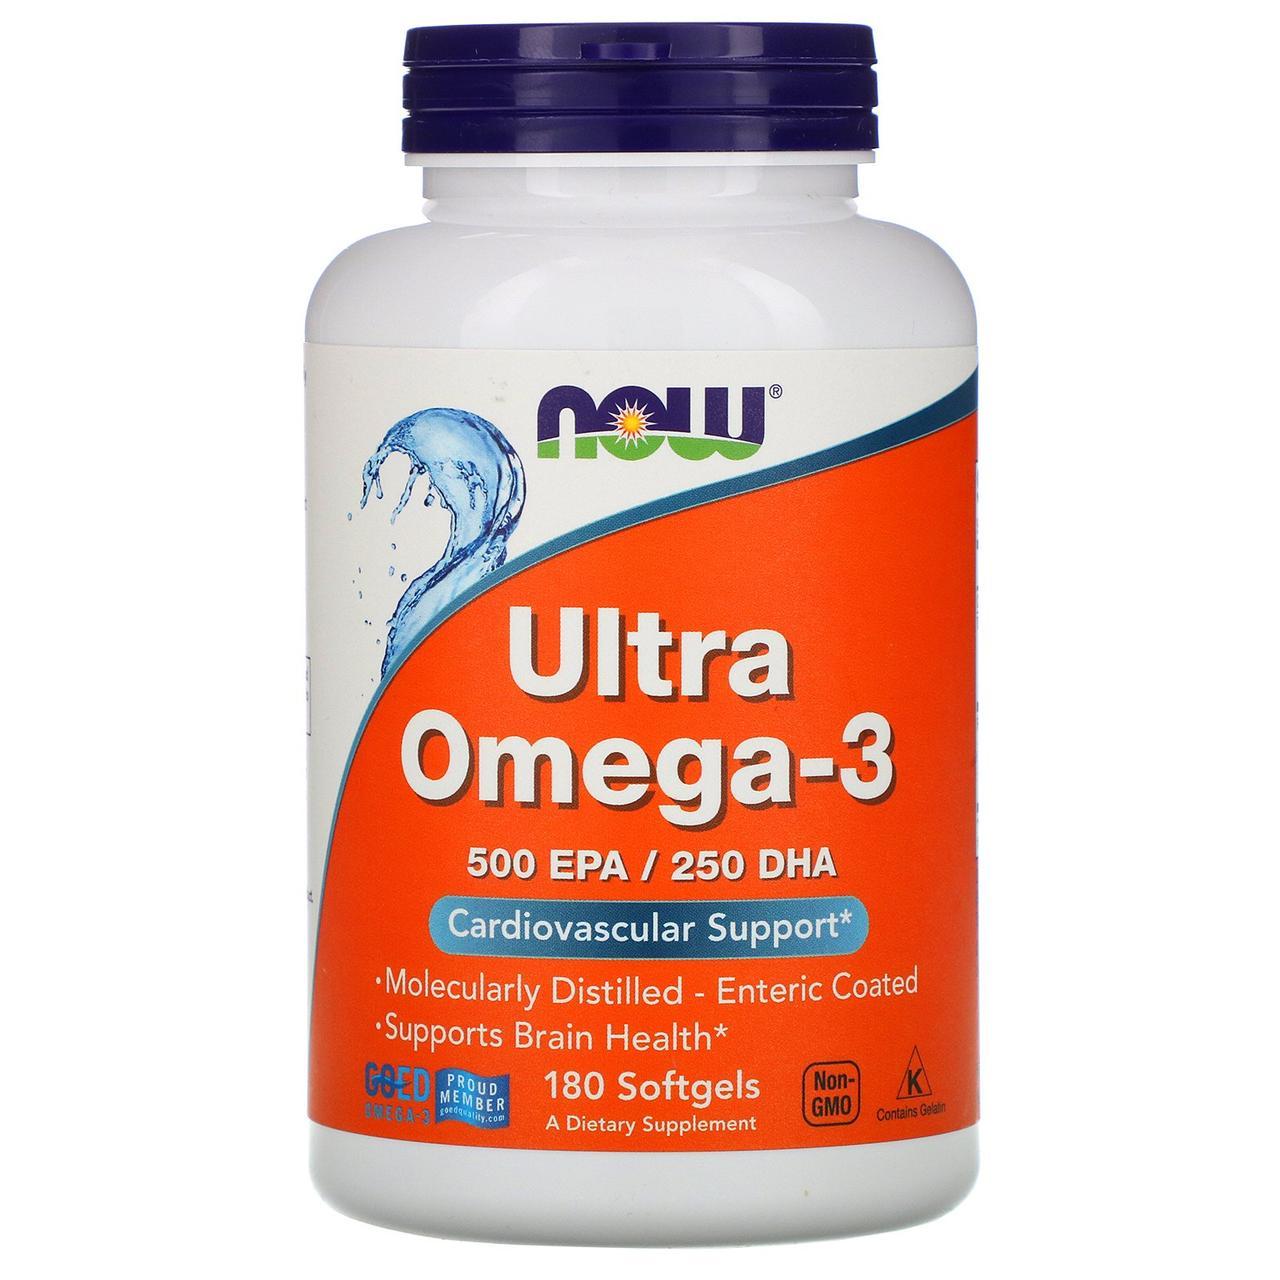 Ультра омега 3 Now Foods, 500 ЭПК/250 ДГК, 180 мягких таблеток